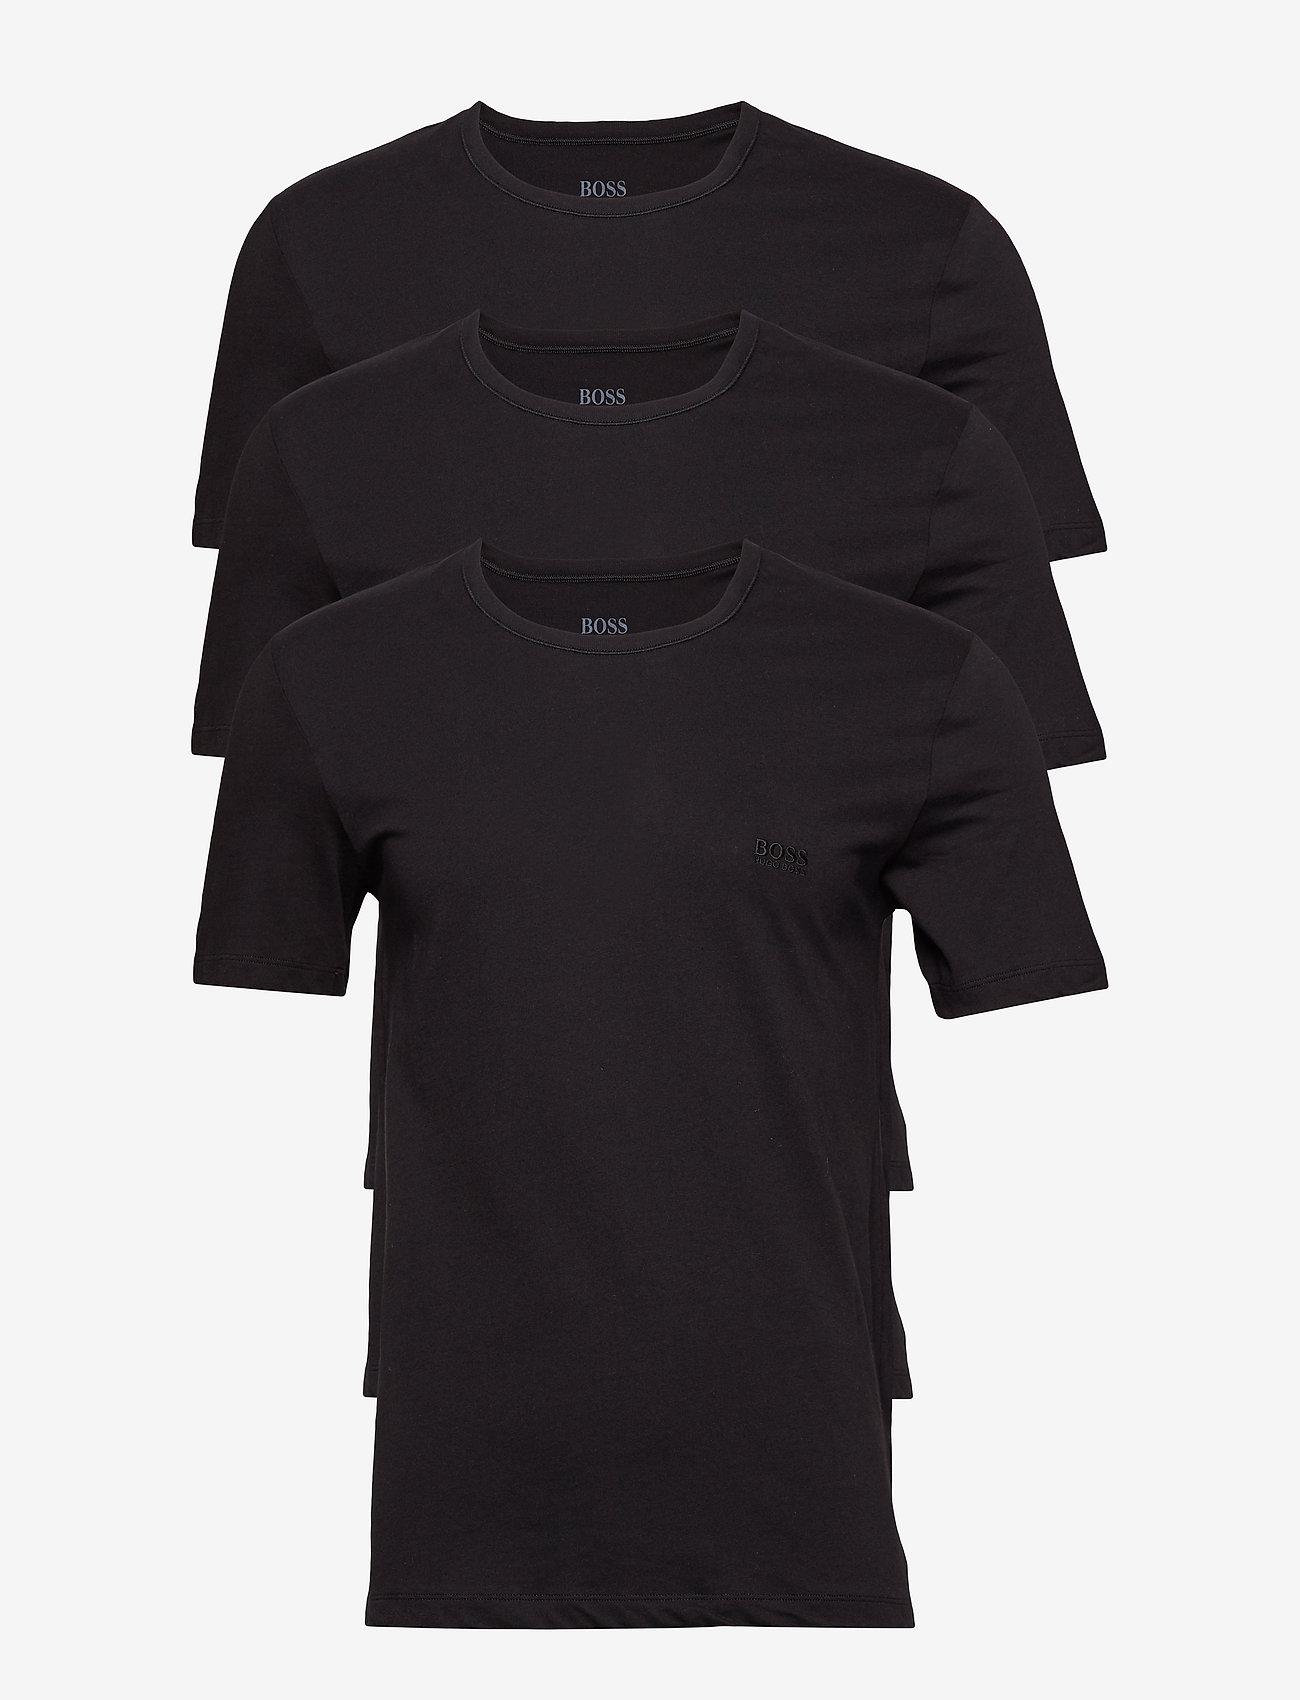 BOSS - T-Shirt RN 3P CO - multipack - black - 1